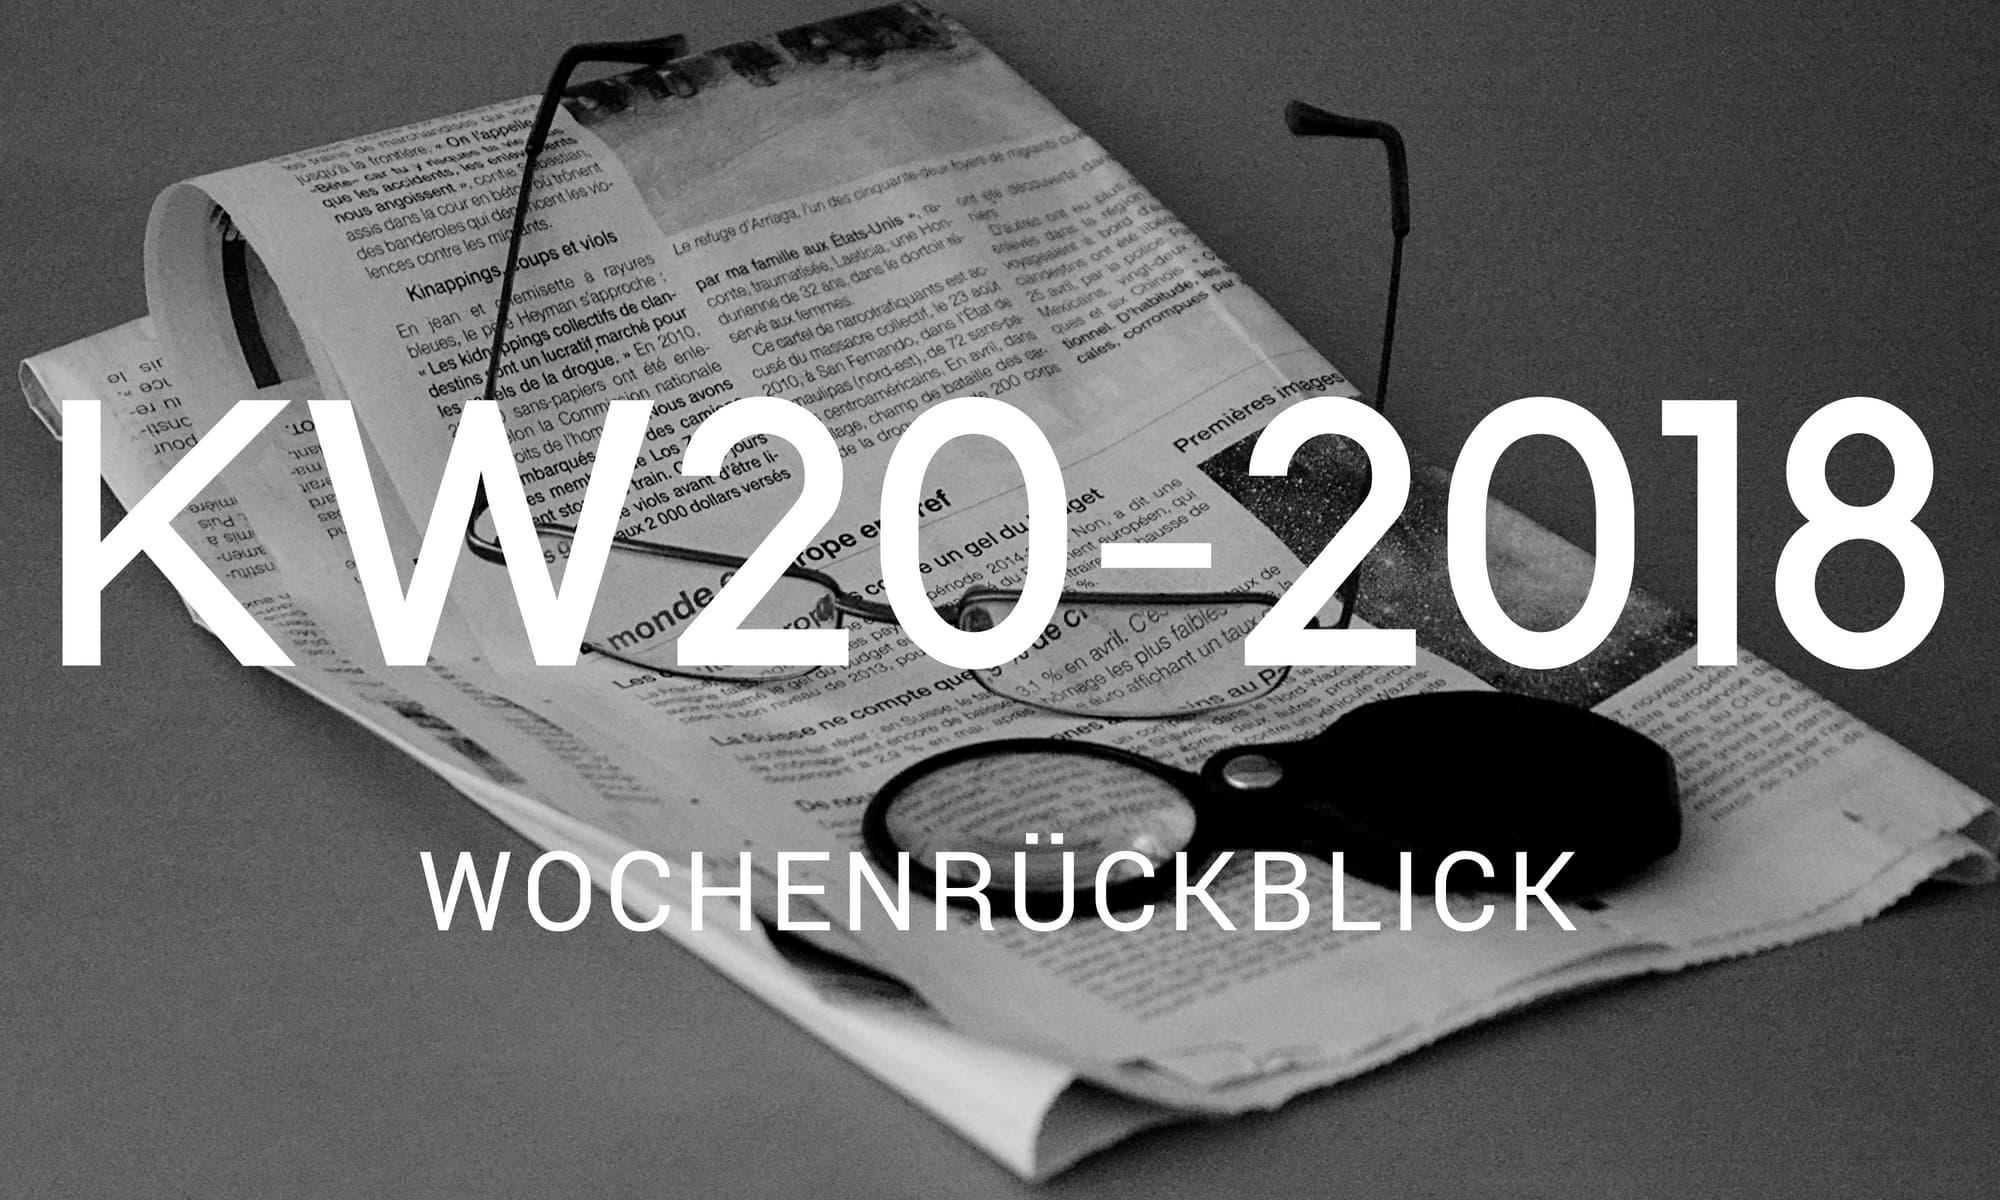 wochenrueckblick camping news KW20 2018